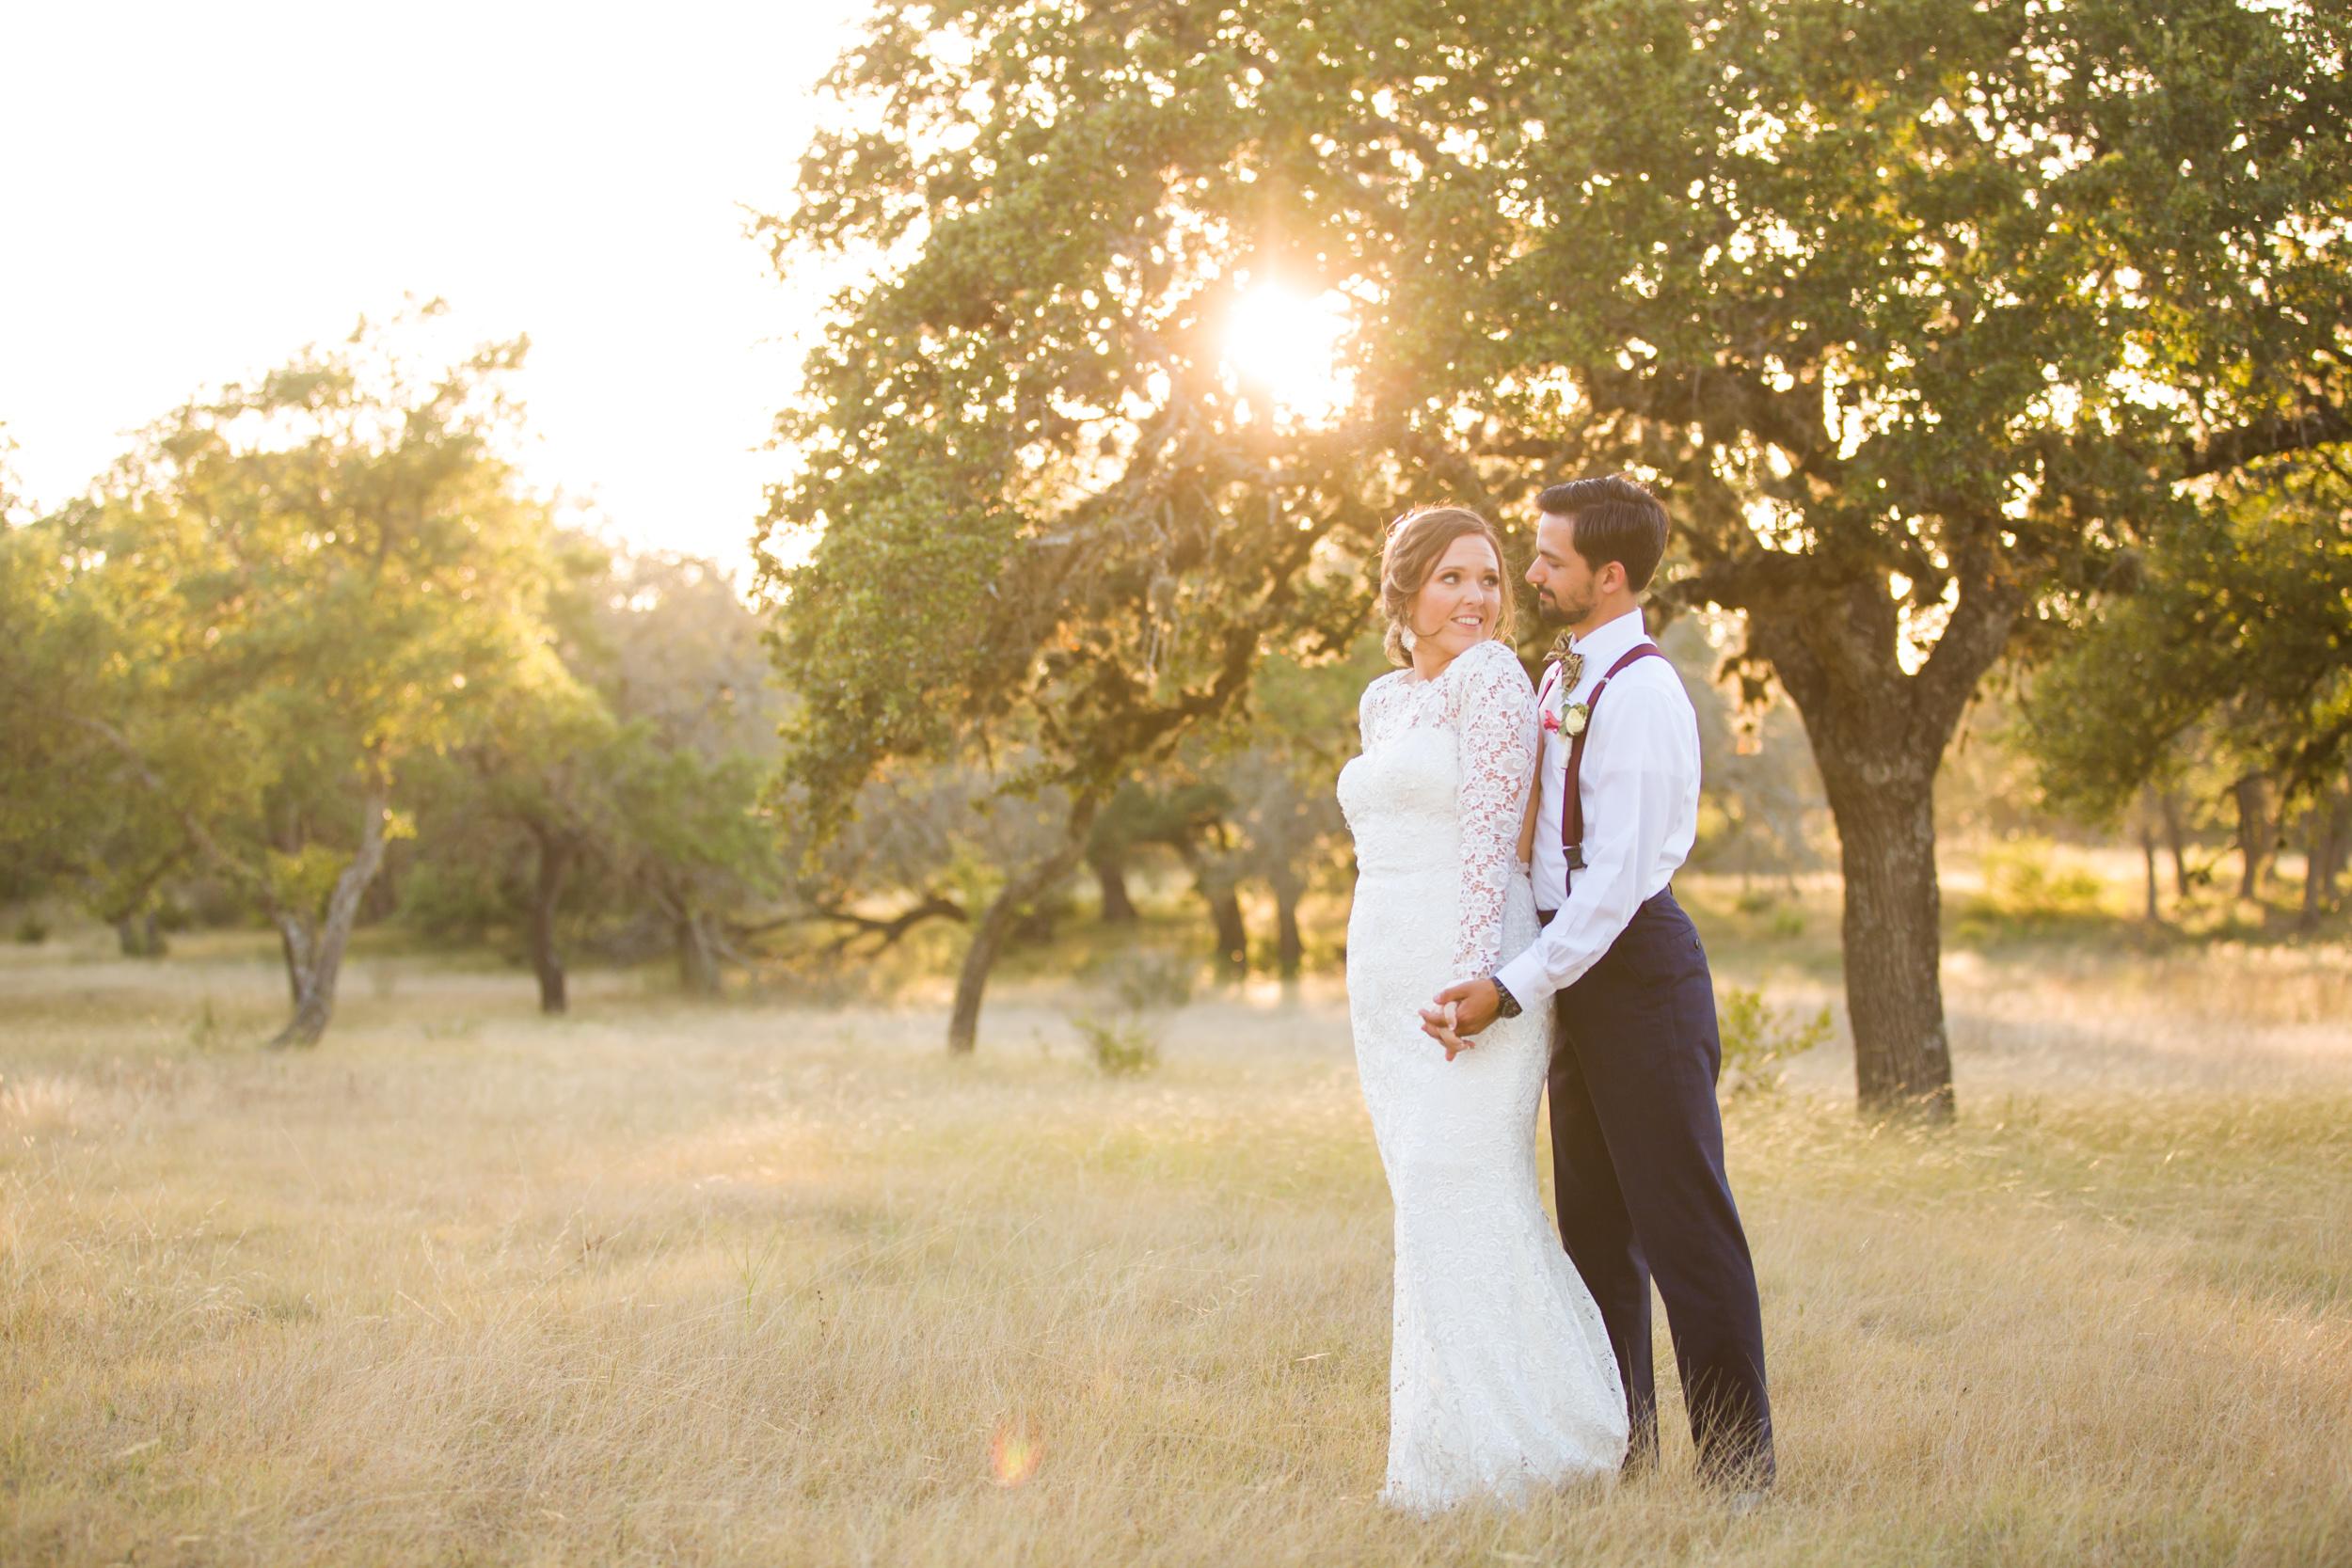 austin-wedding-colorful-40.jpg